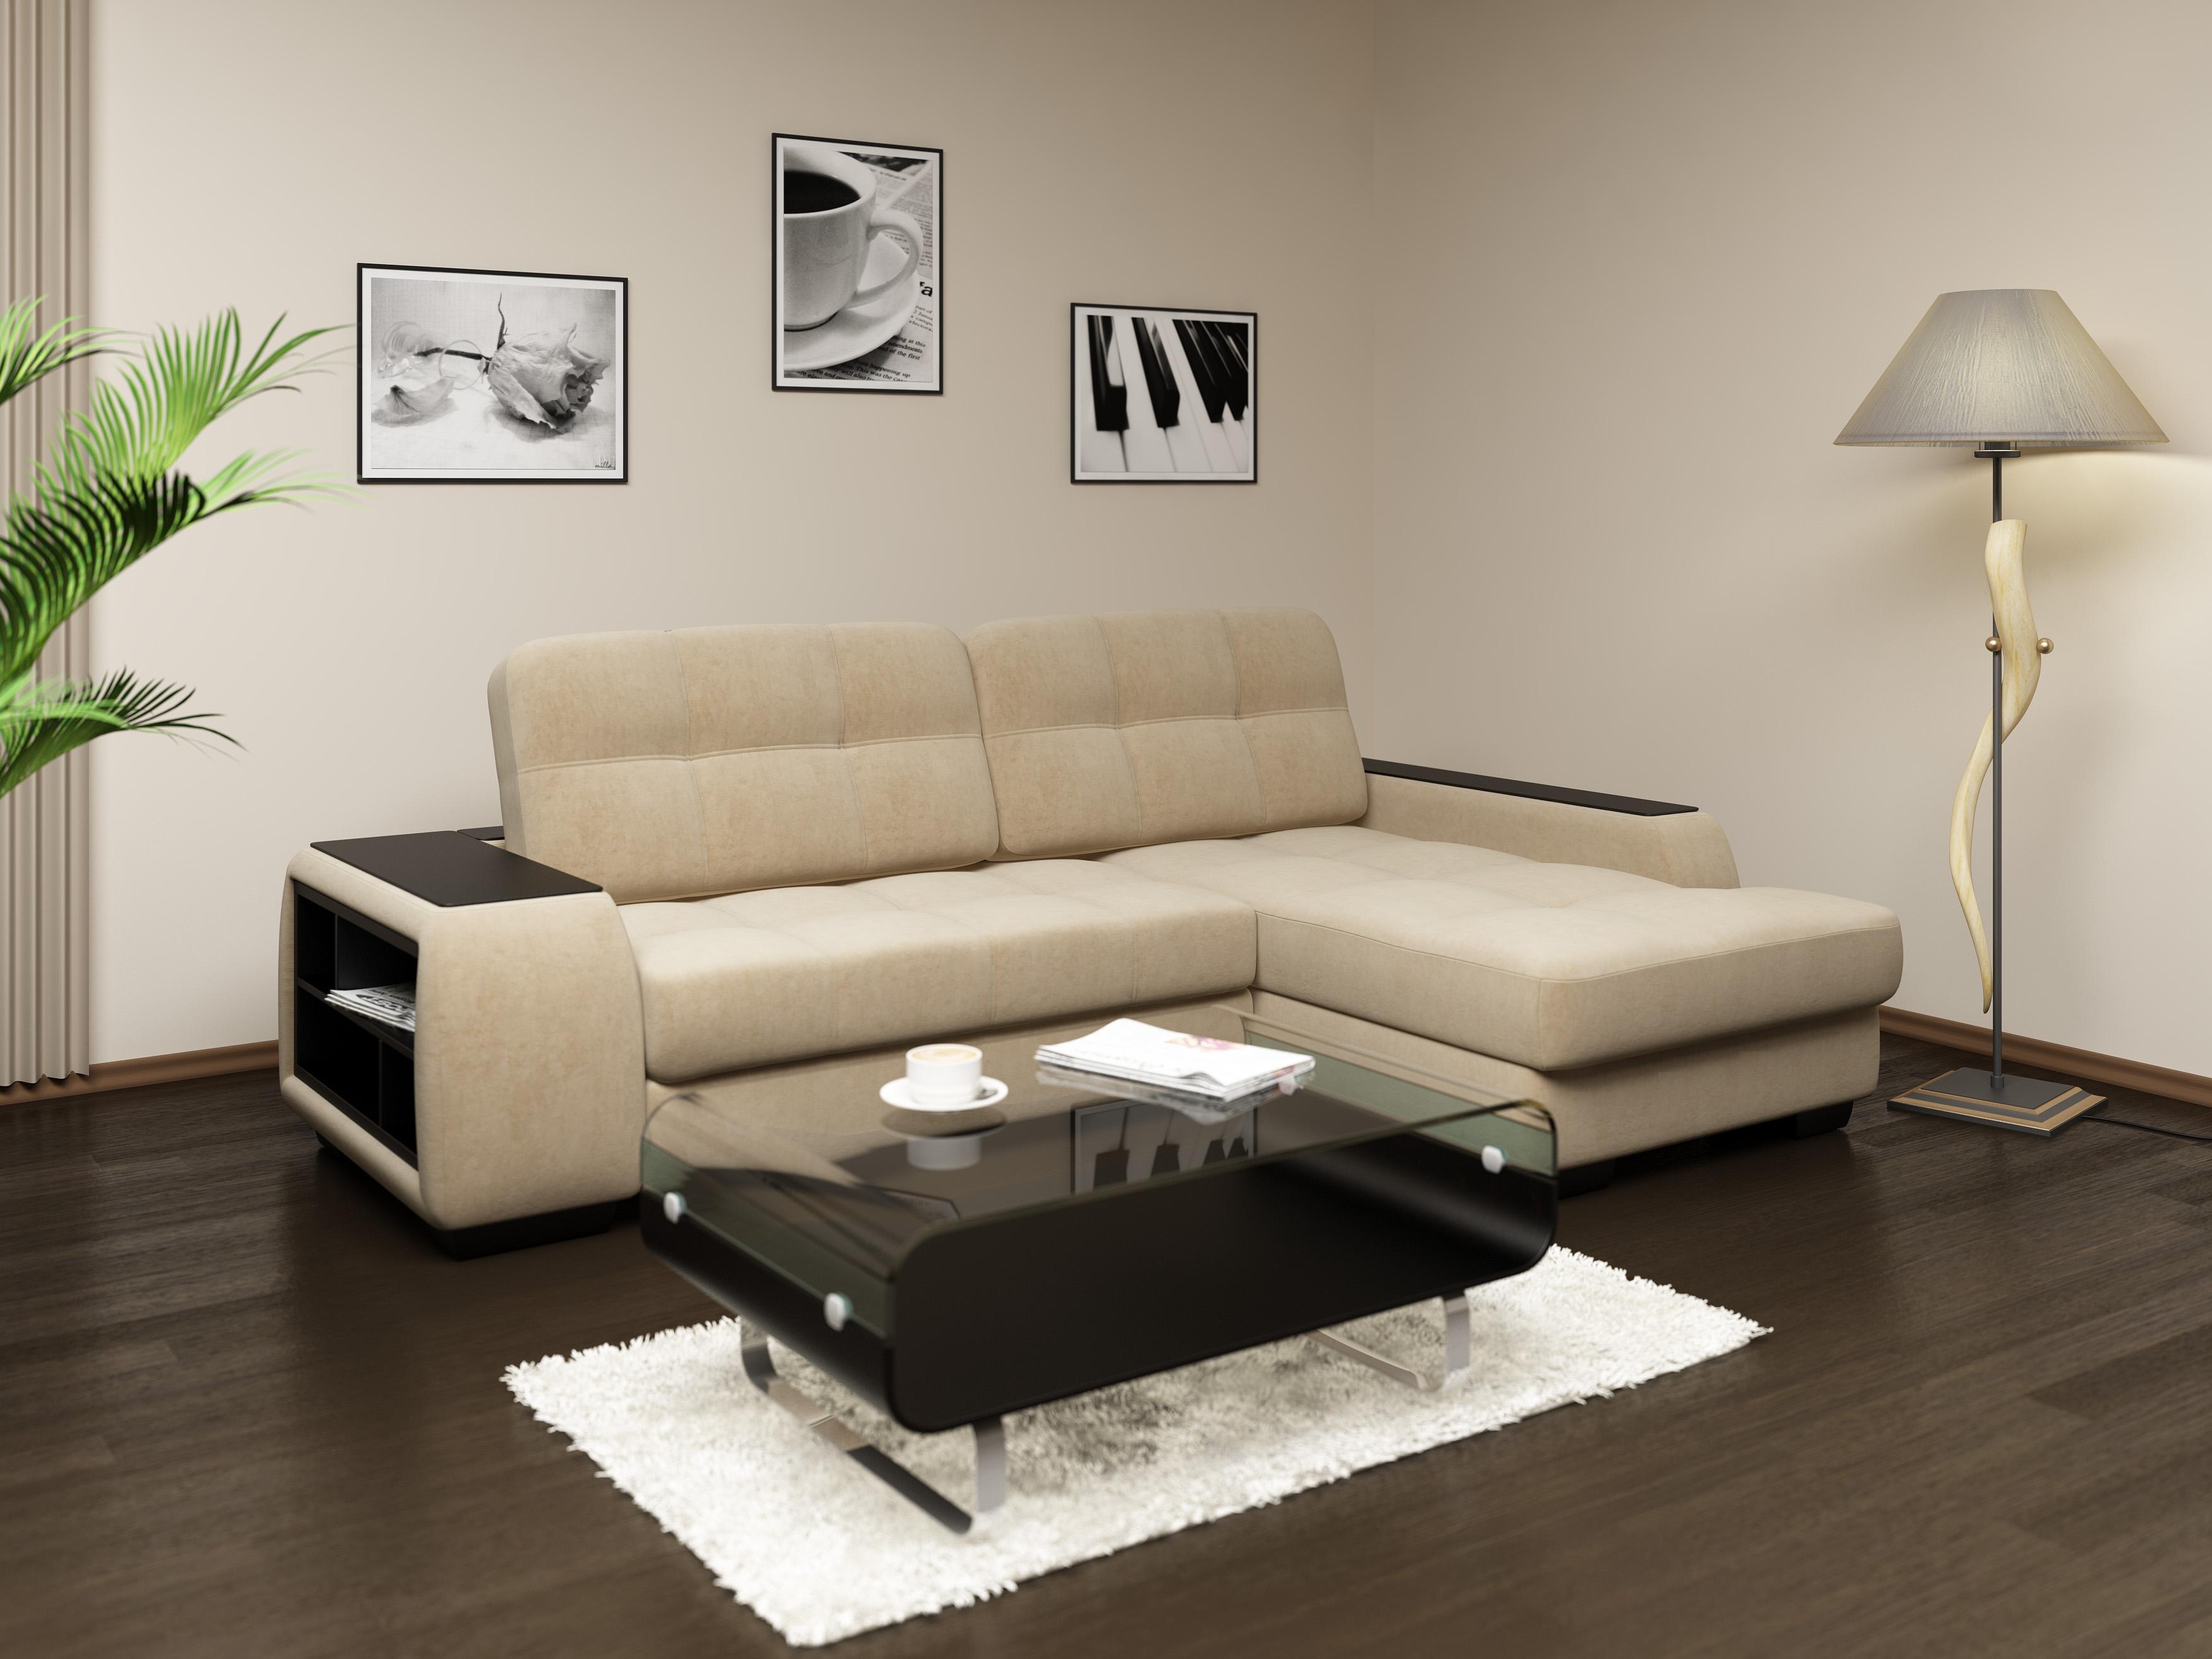 Дизайн углового дивана